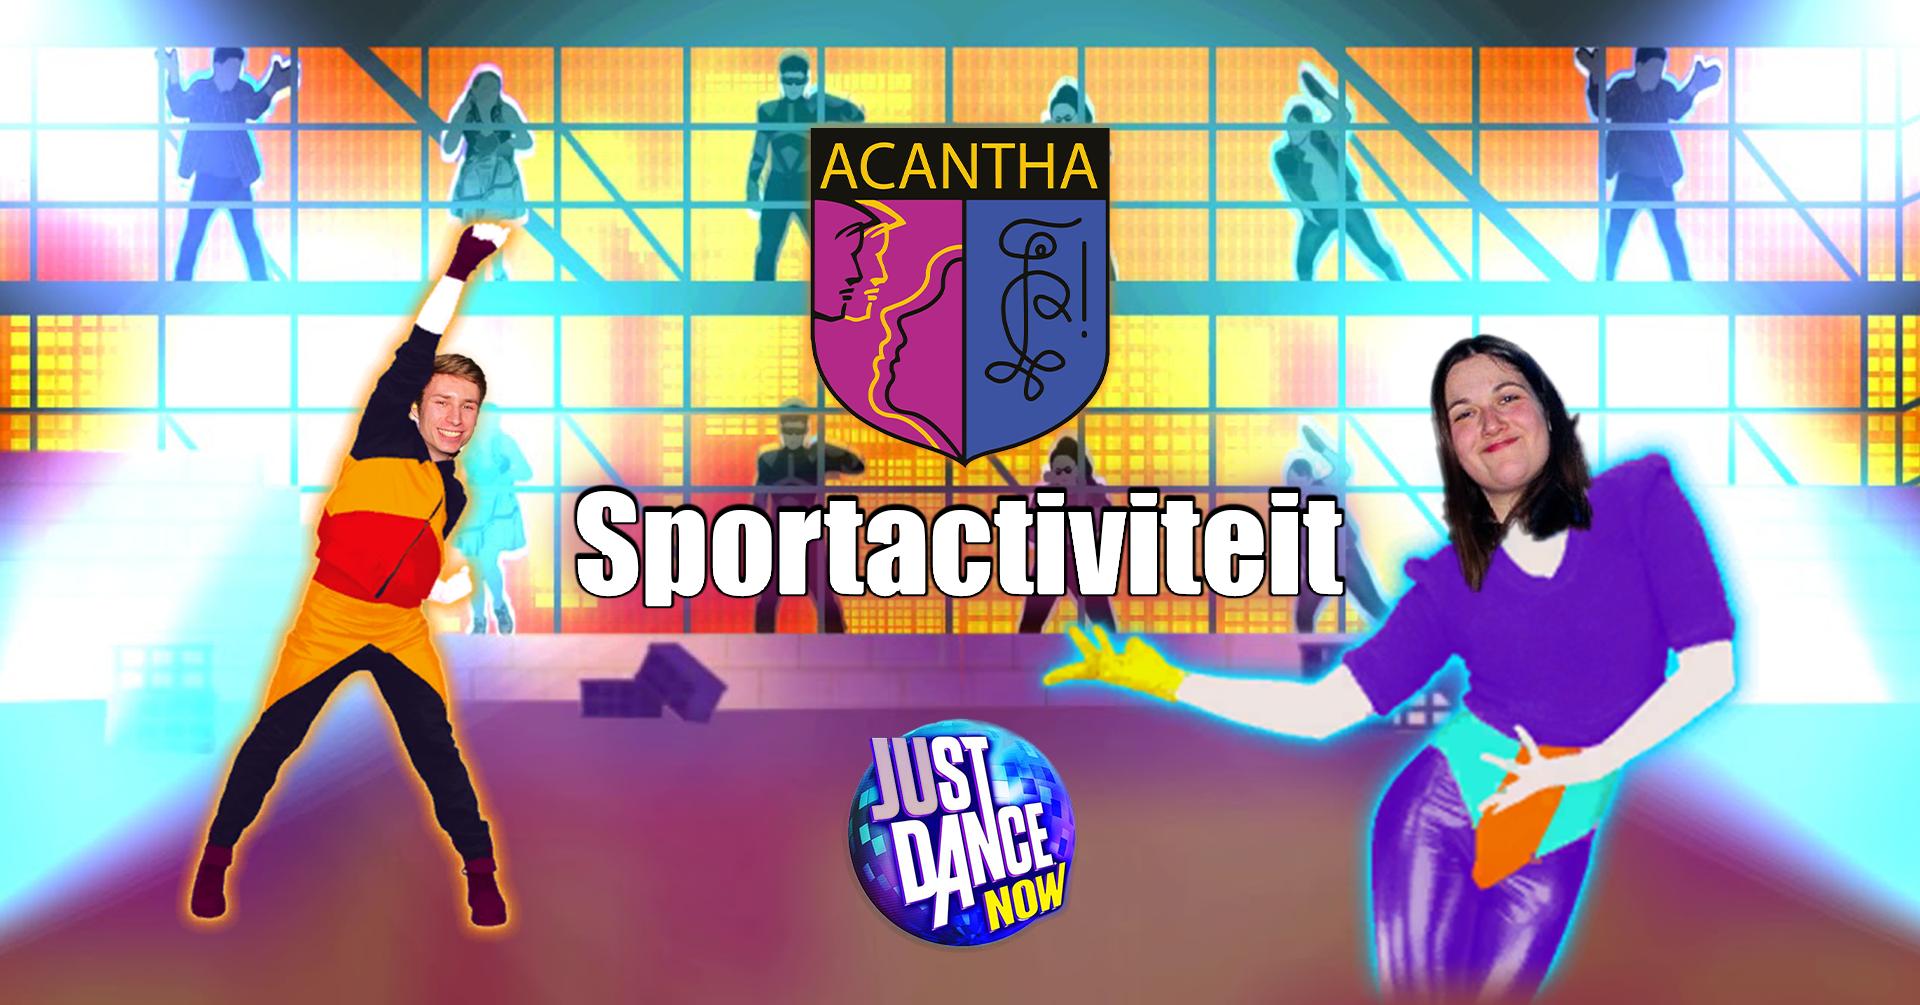 Sportactiviteit Just Dance Online Acantha